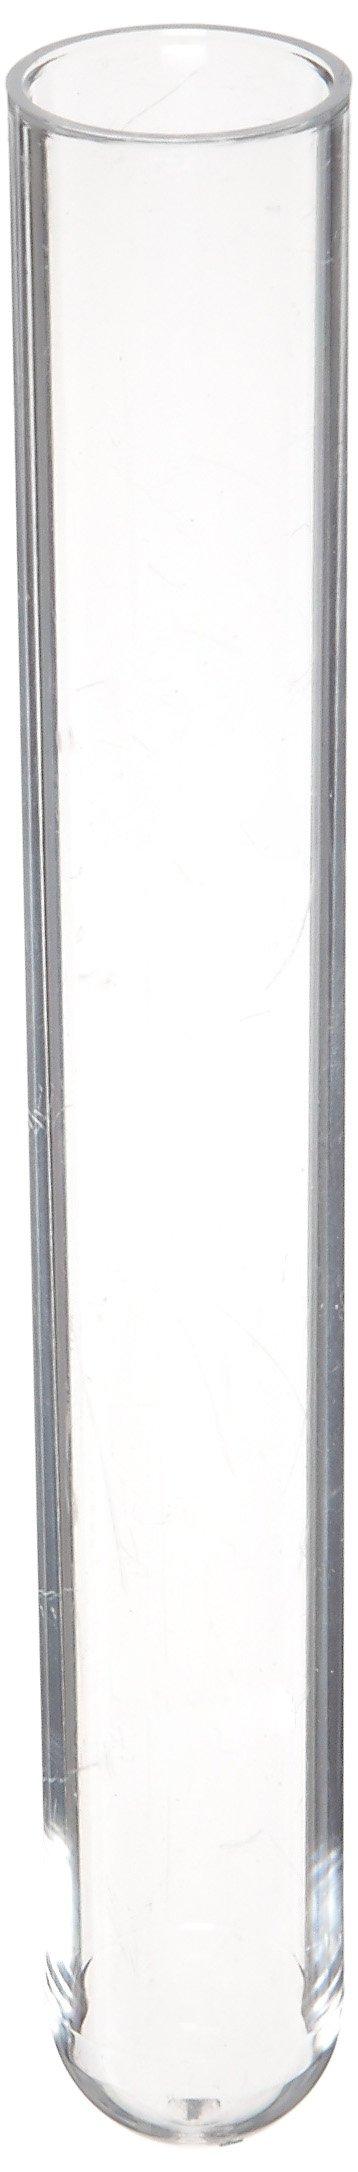 American Educational Plastic 10mL Culture Tube, 100mm Length x 15mm Width (Pack of 250)